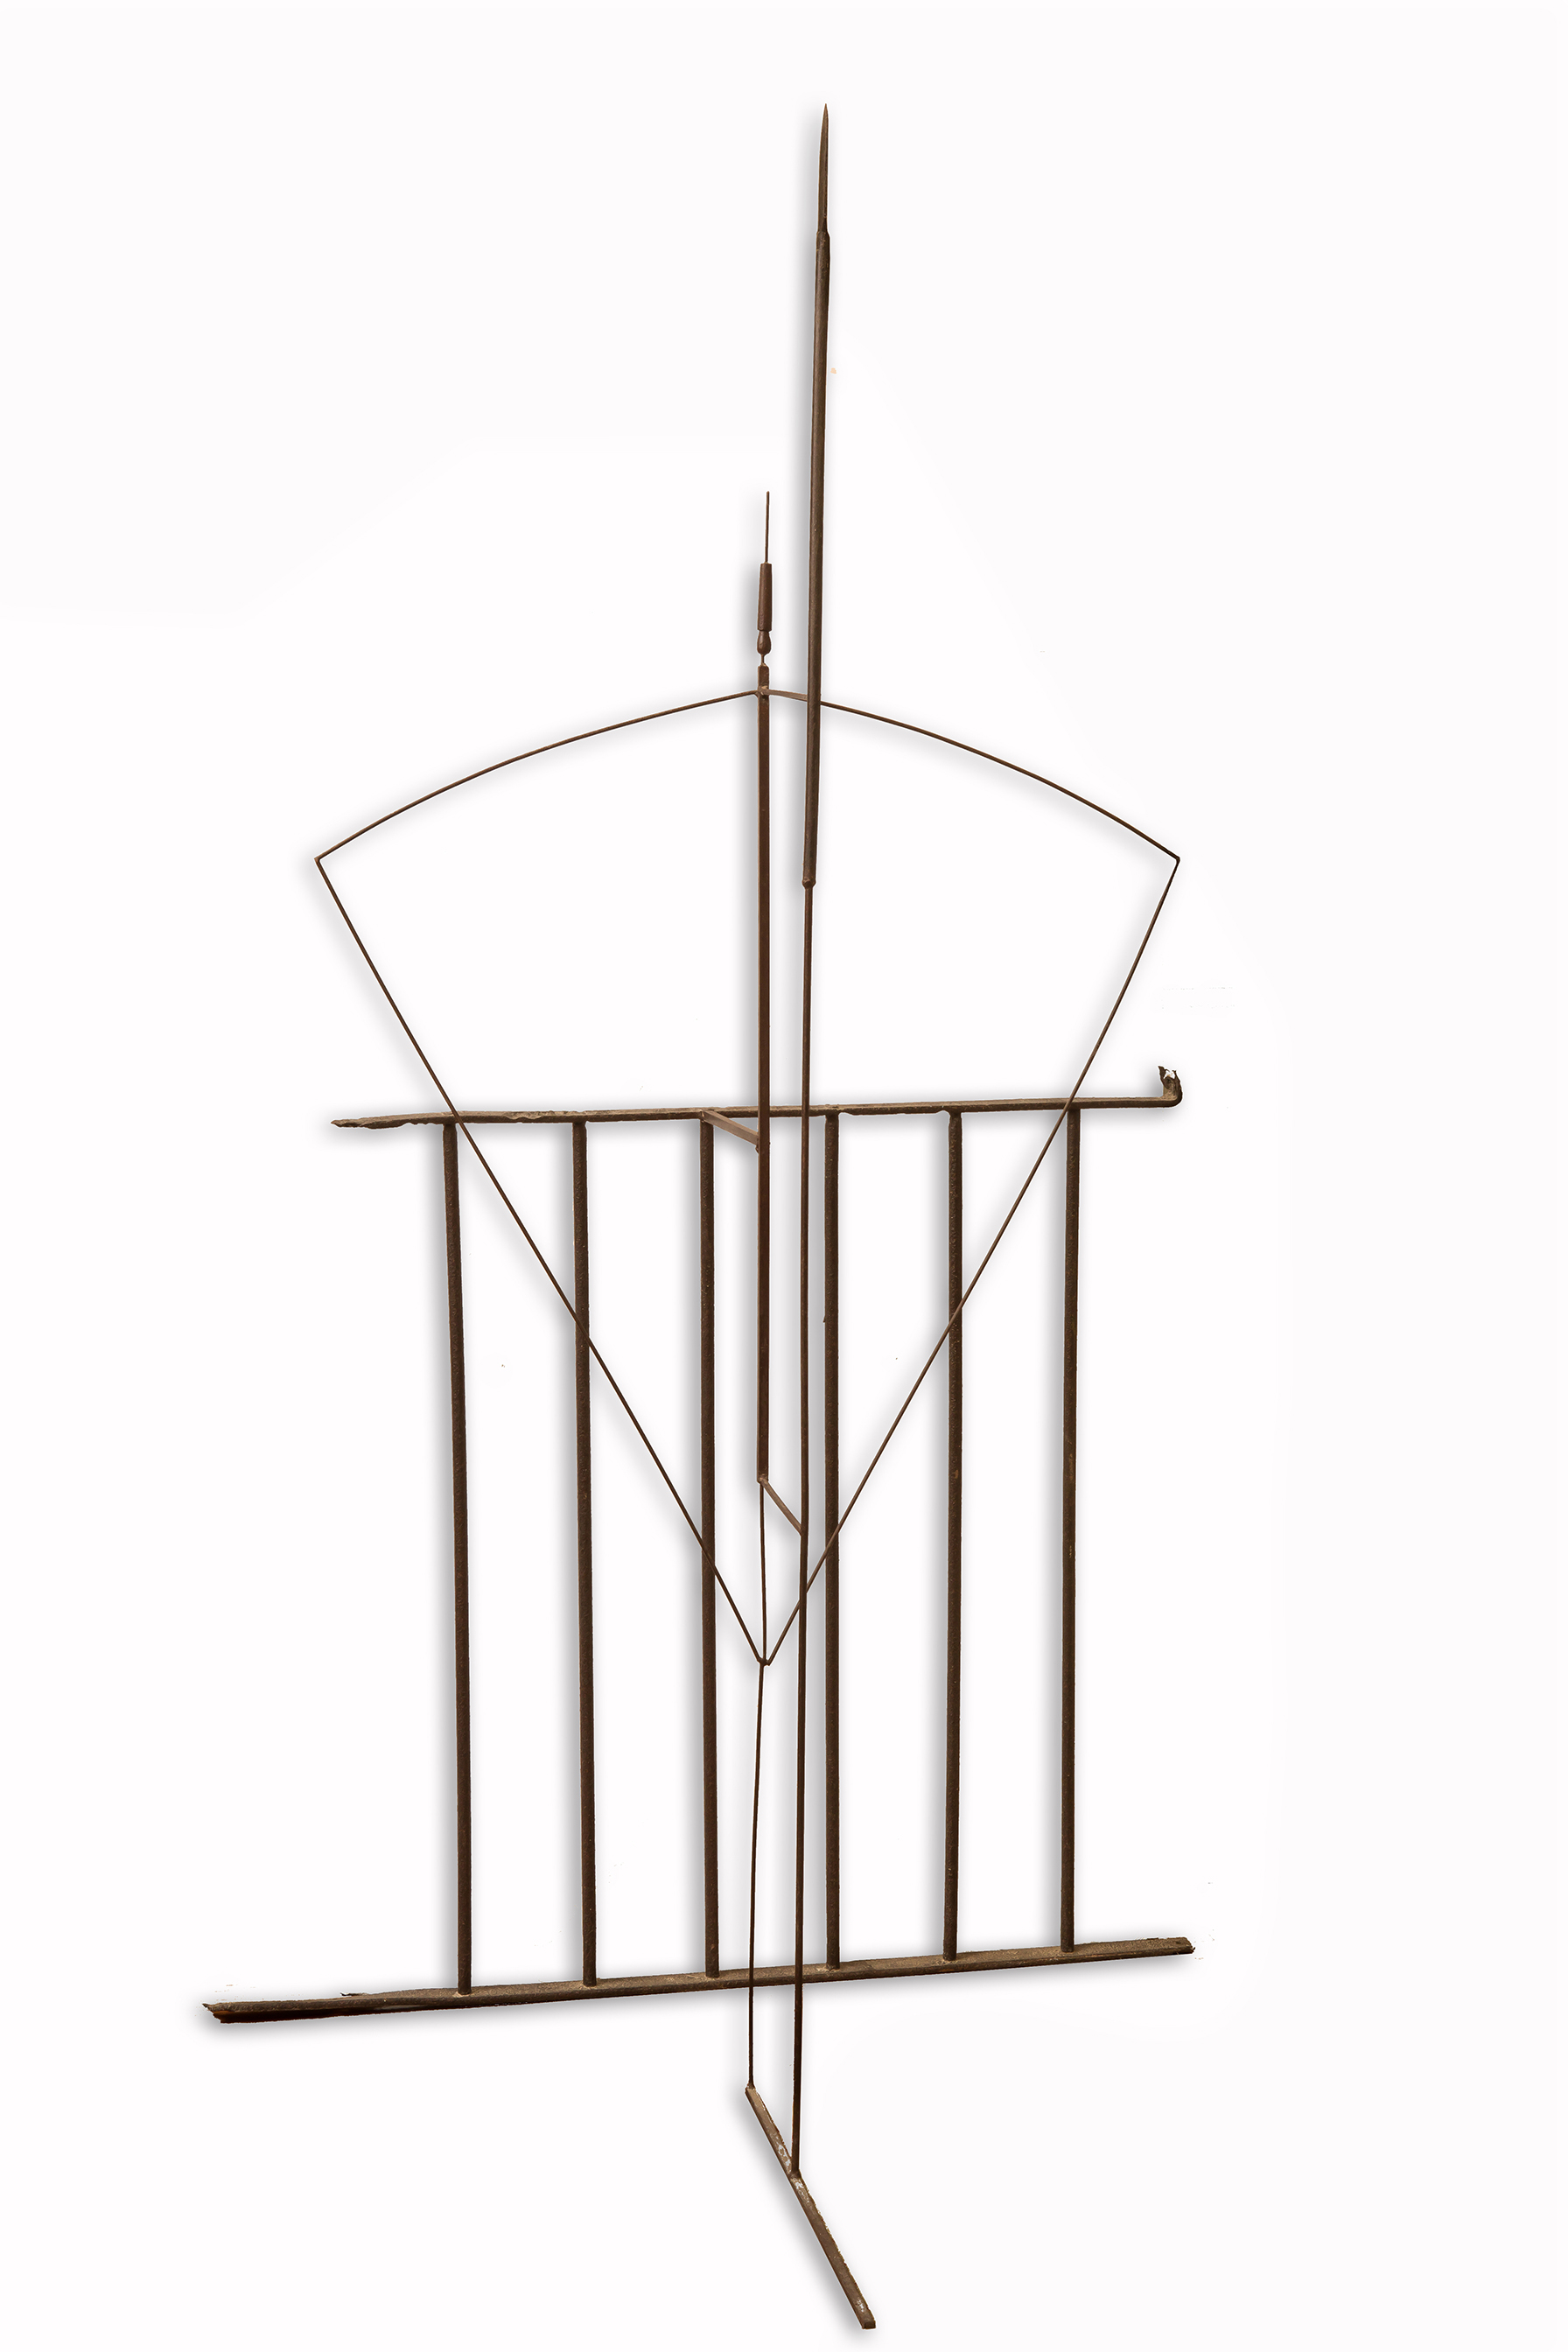 Jaume Plensa. Darrera, 1982. Salida: 40.000 euros. No vendida